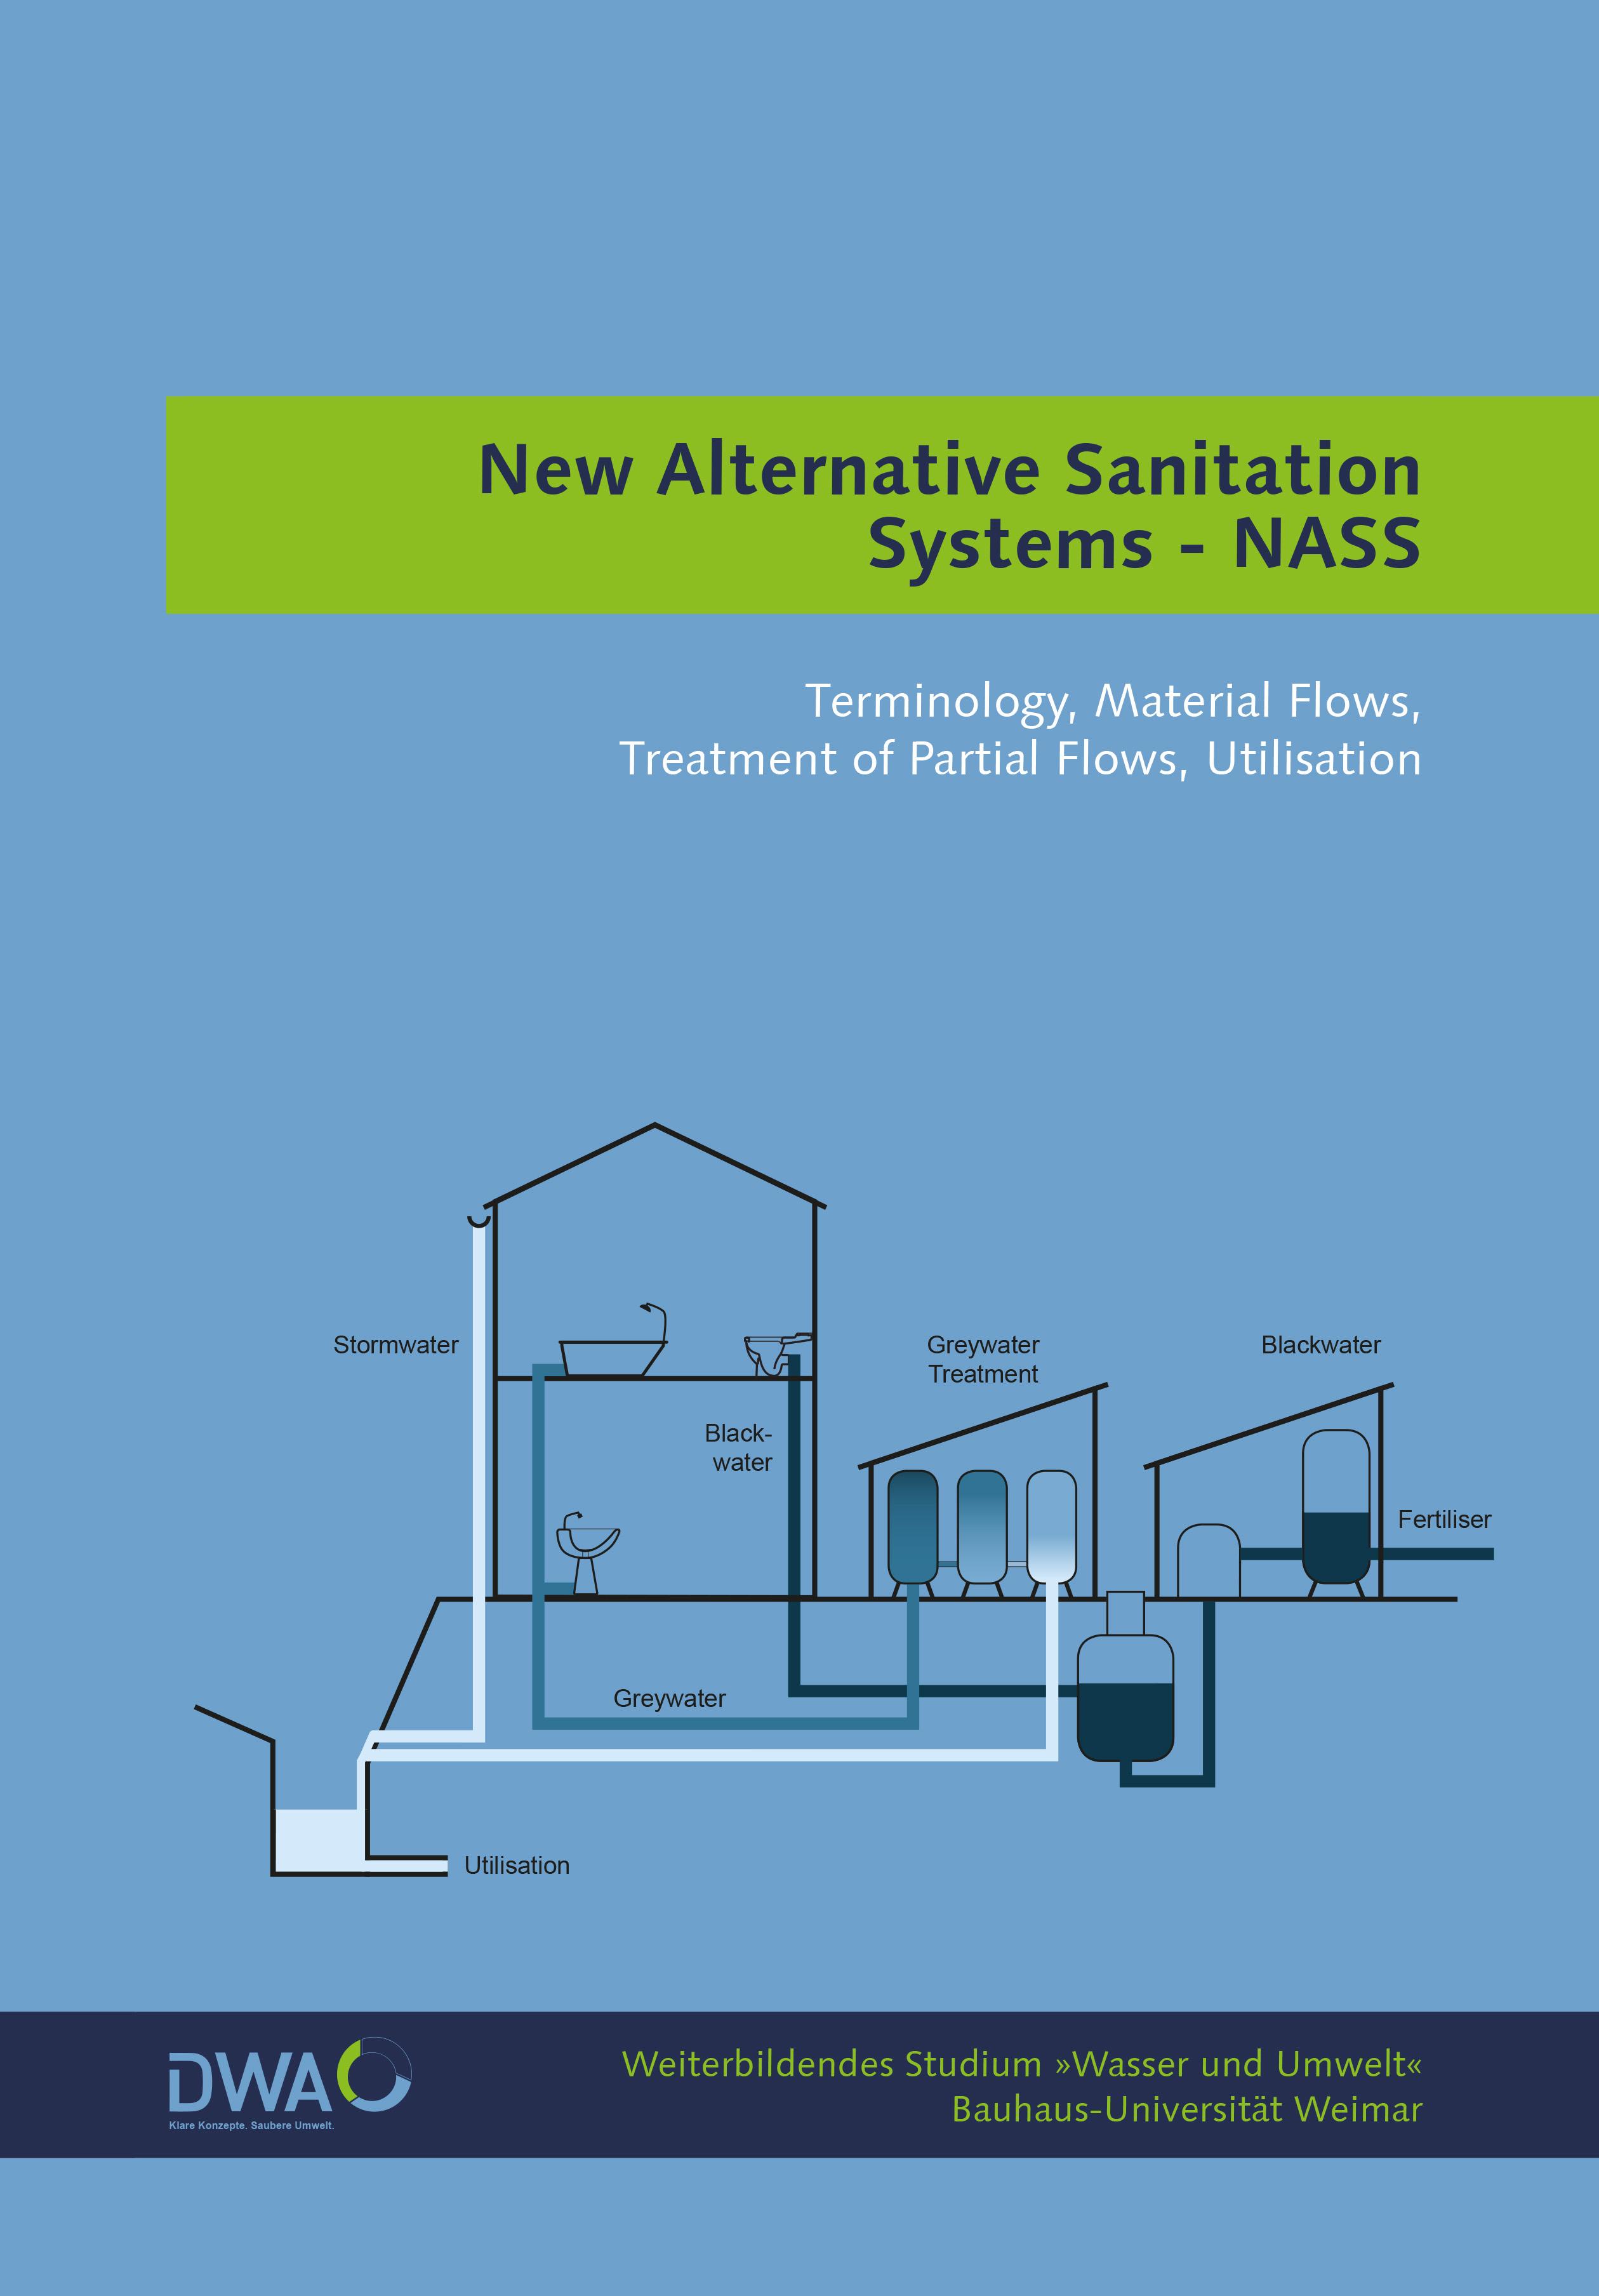 New Alternative Sanitation Systems - NASS